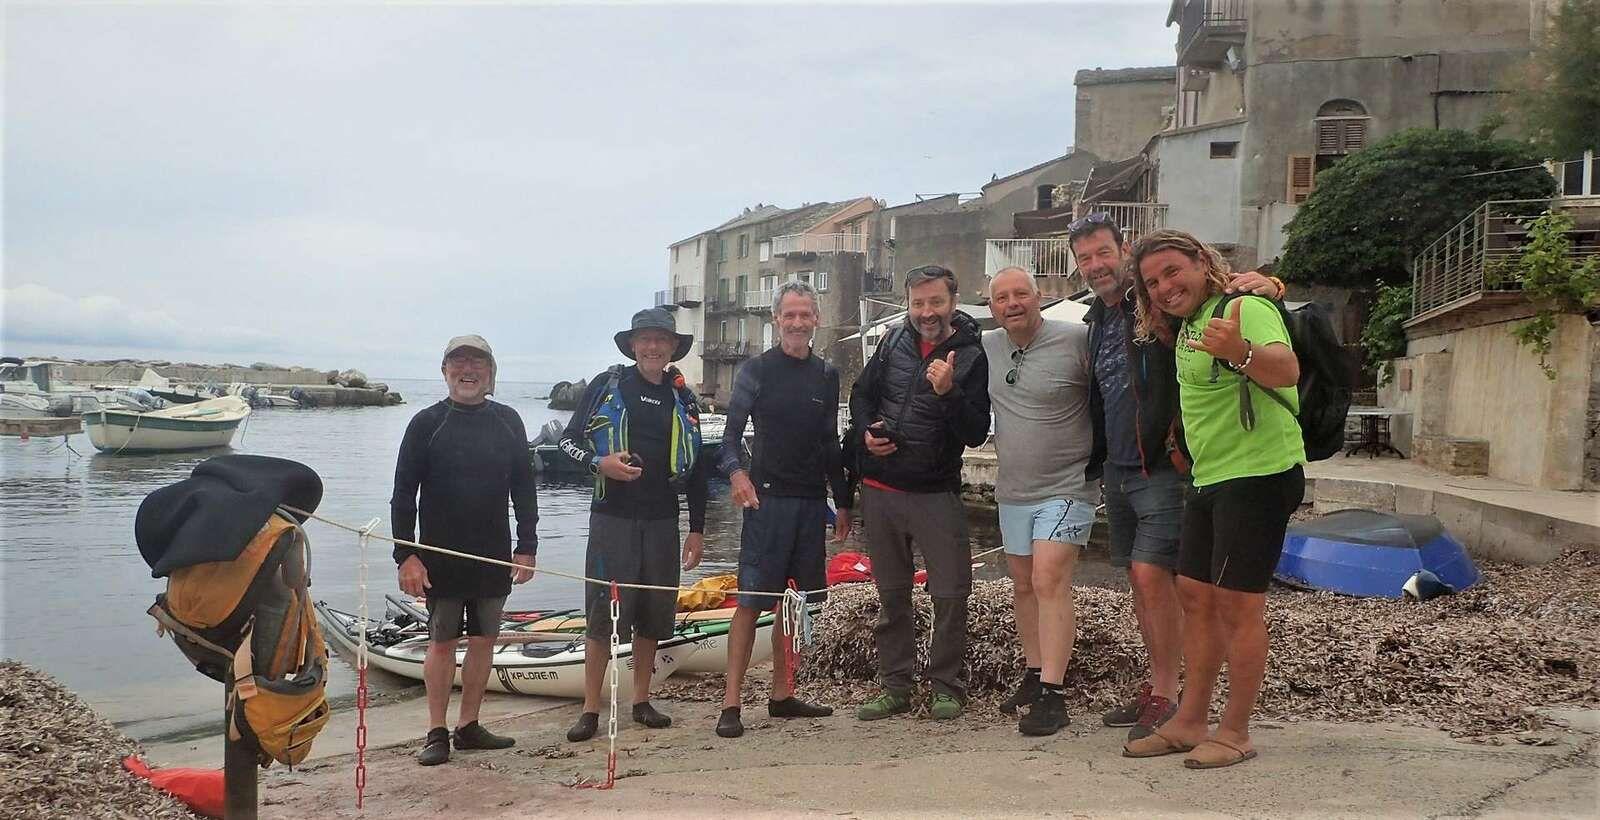 Corsica 2021, la beauté, essentielle, de la nature - Chapitre 6 : le Cap Corse, de Santa Severa à Bastia